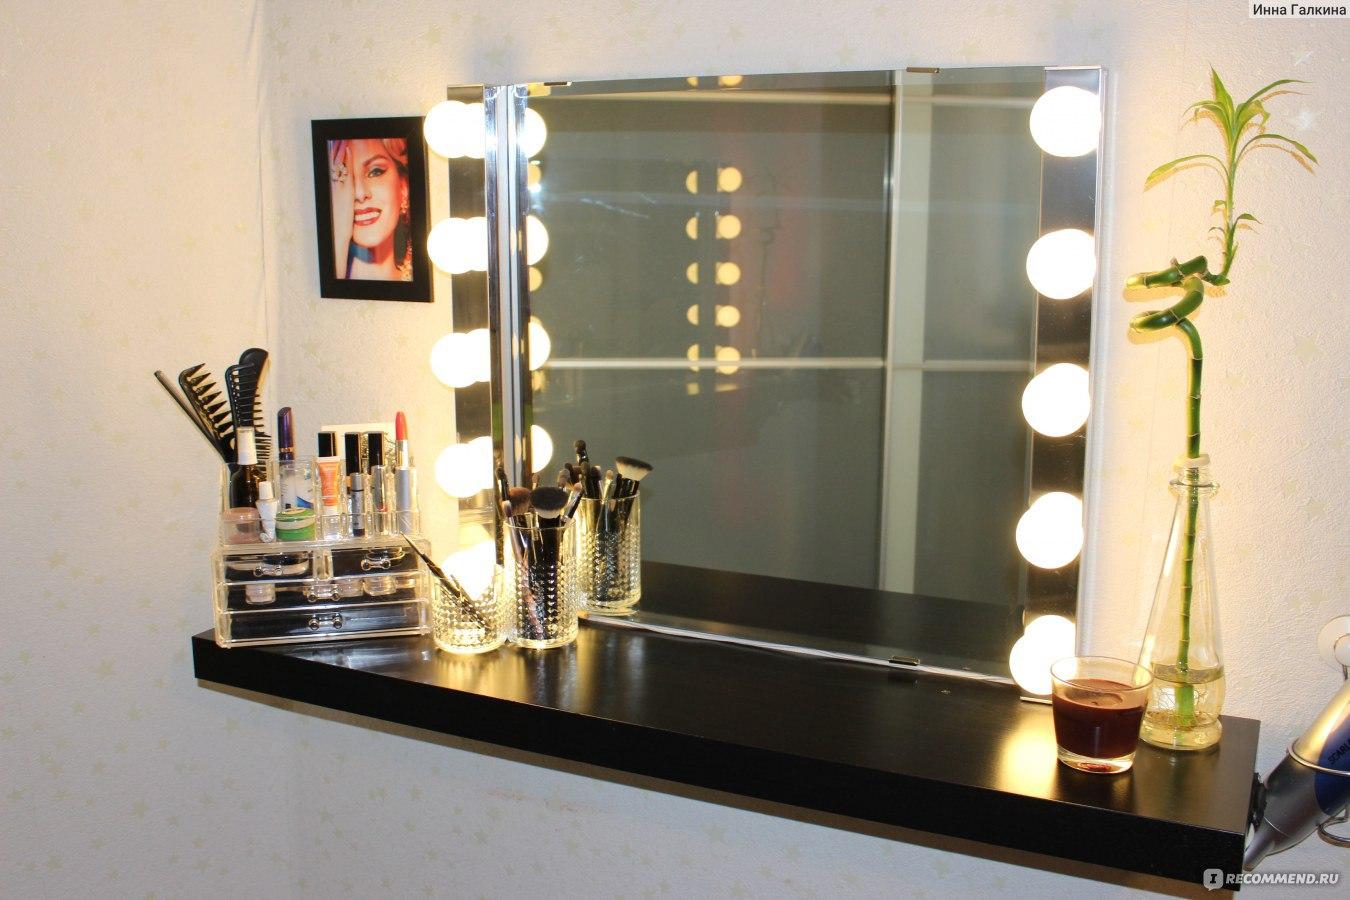 Зеркало для макияжа с подсветкой фото